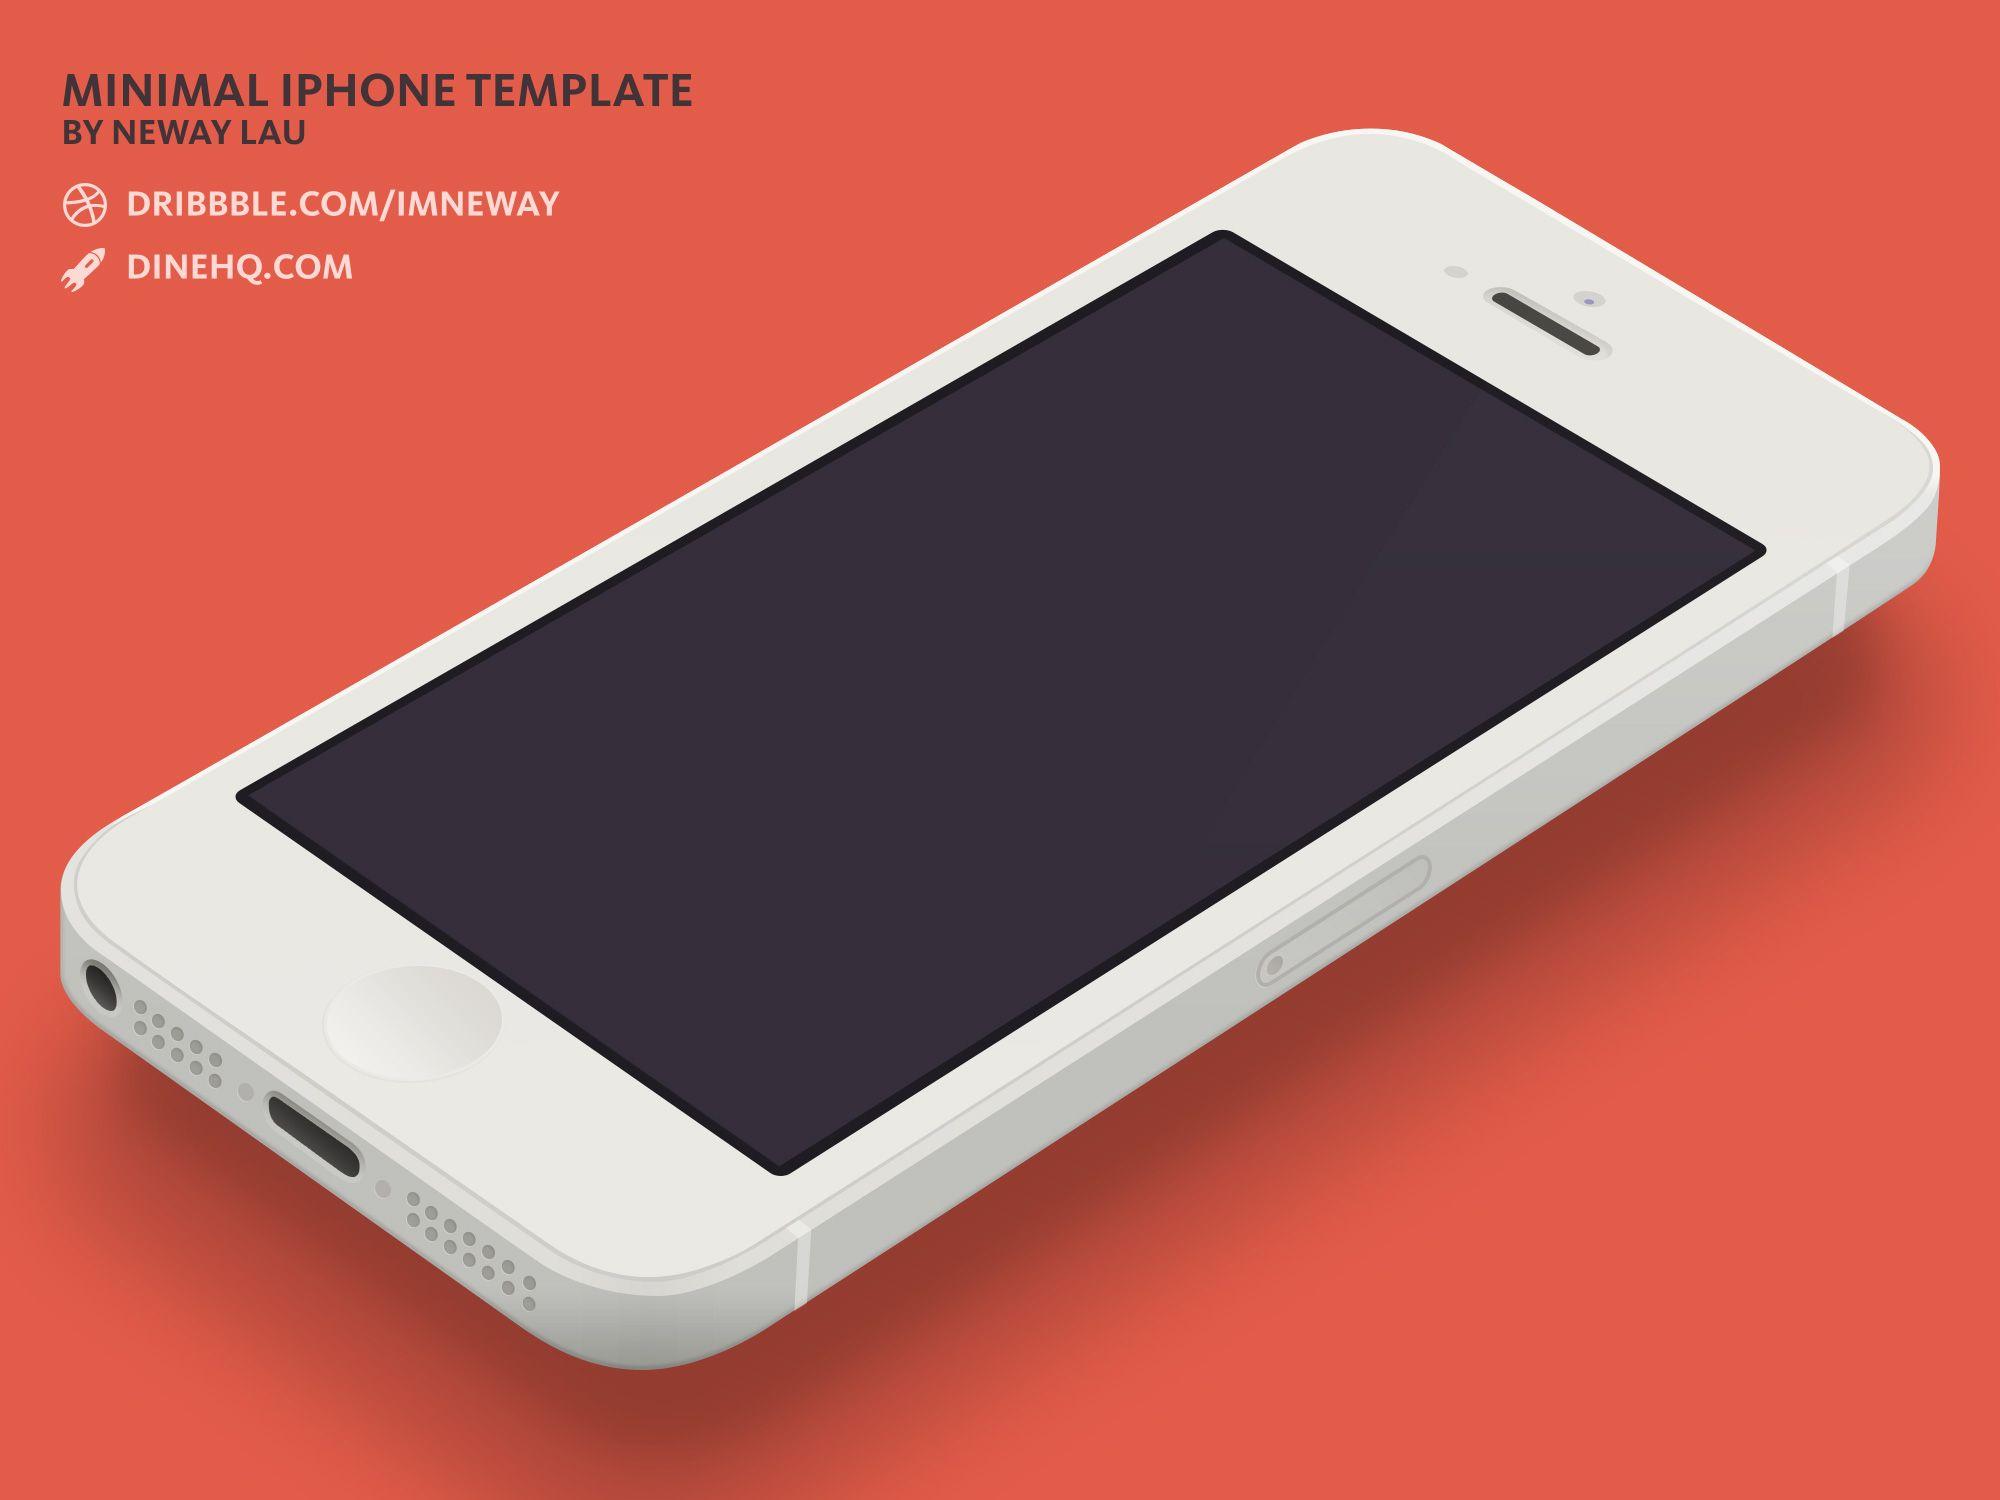 Minimal iPhone 5 Template | Objets | Pinterest | Minimal ...